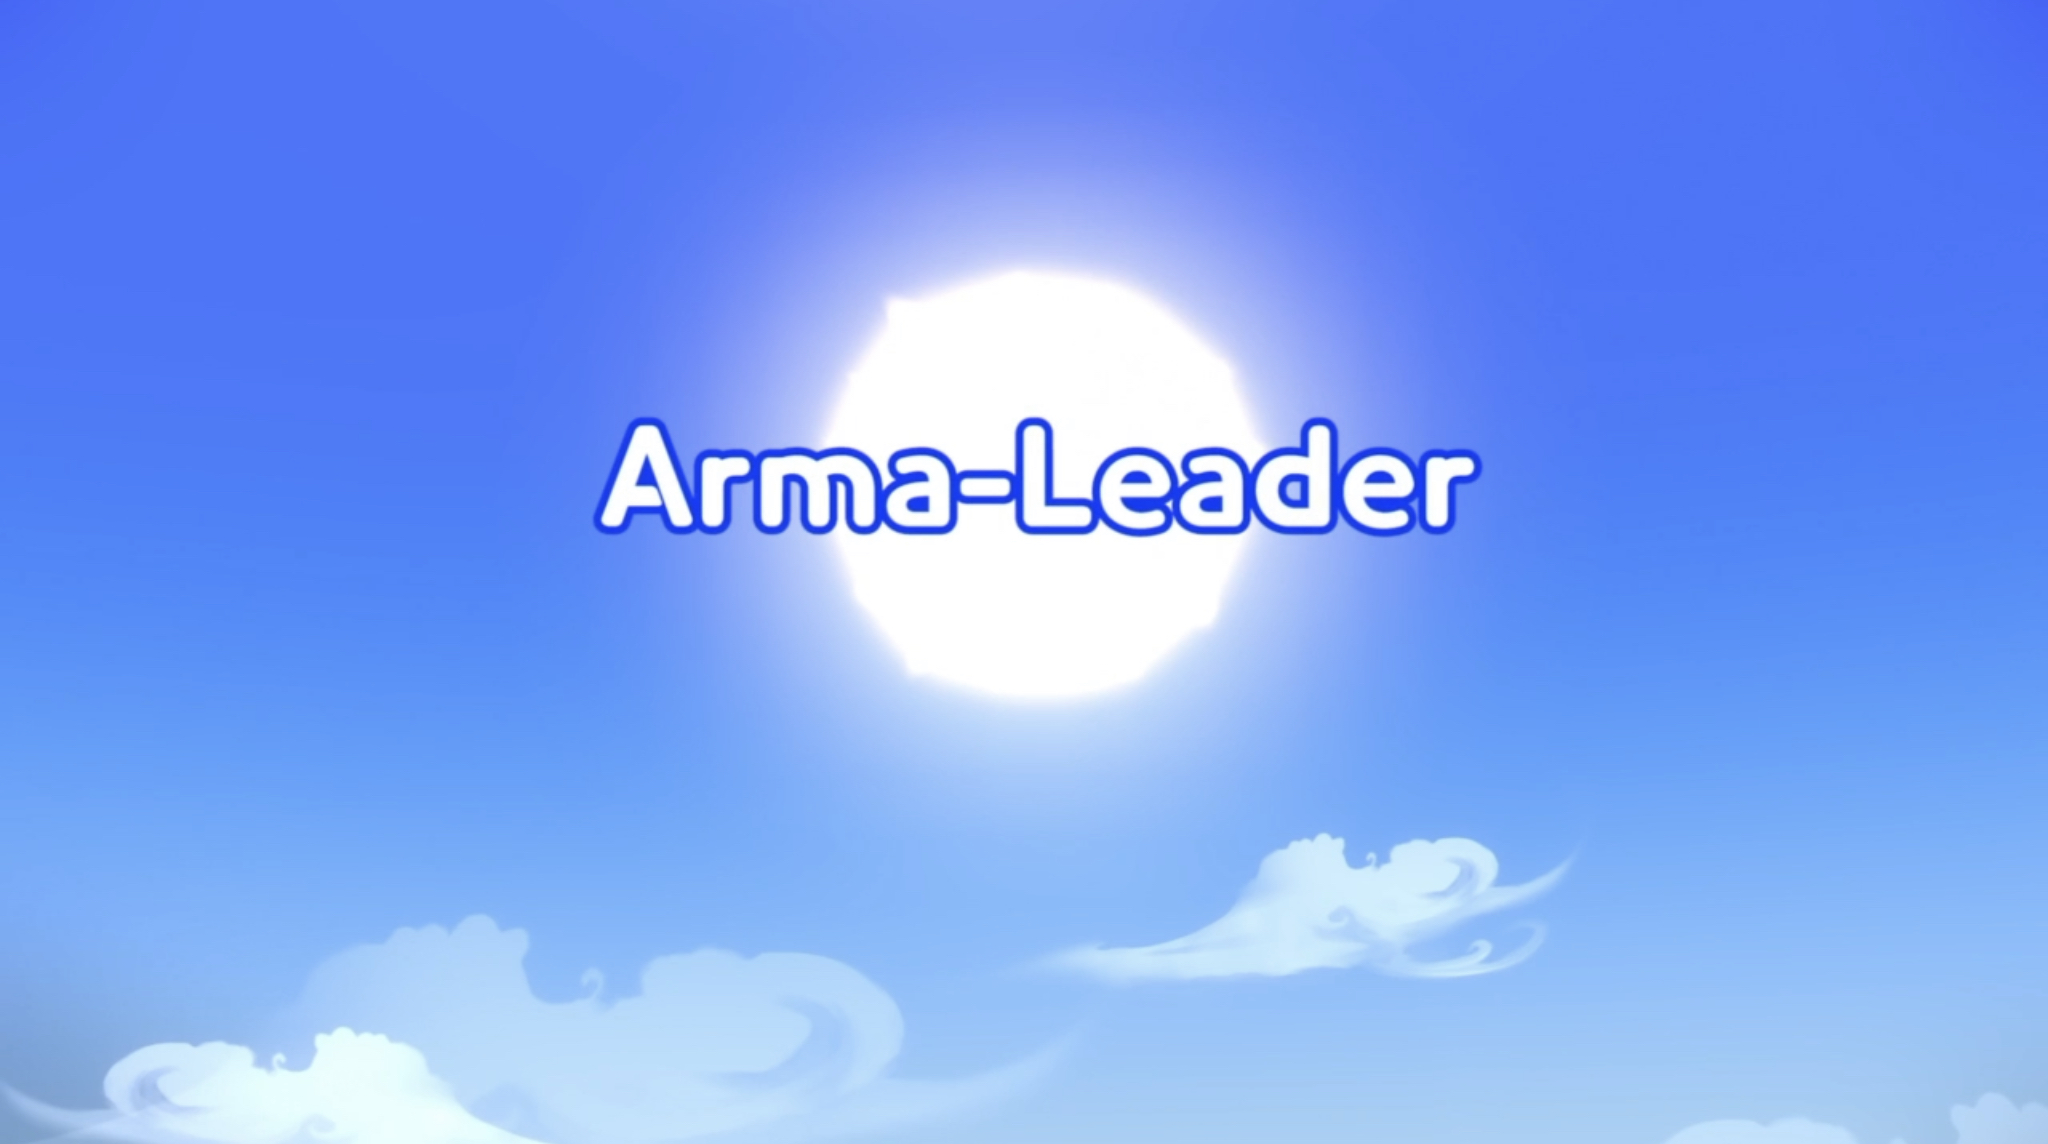 Arma-Leader